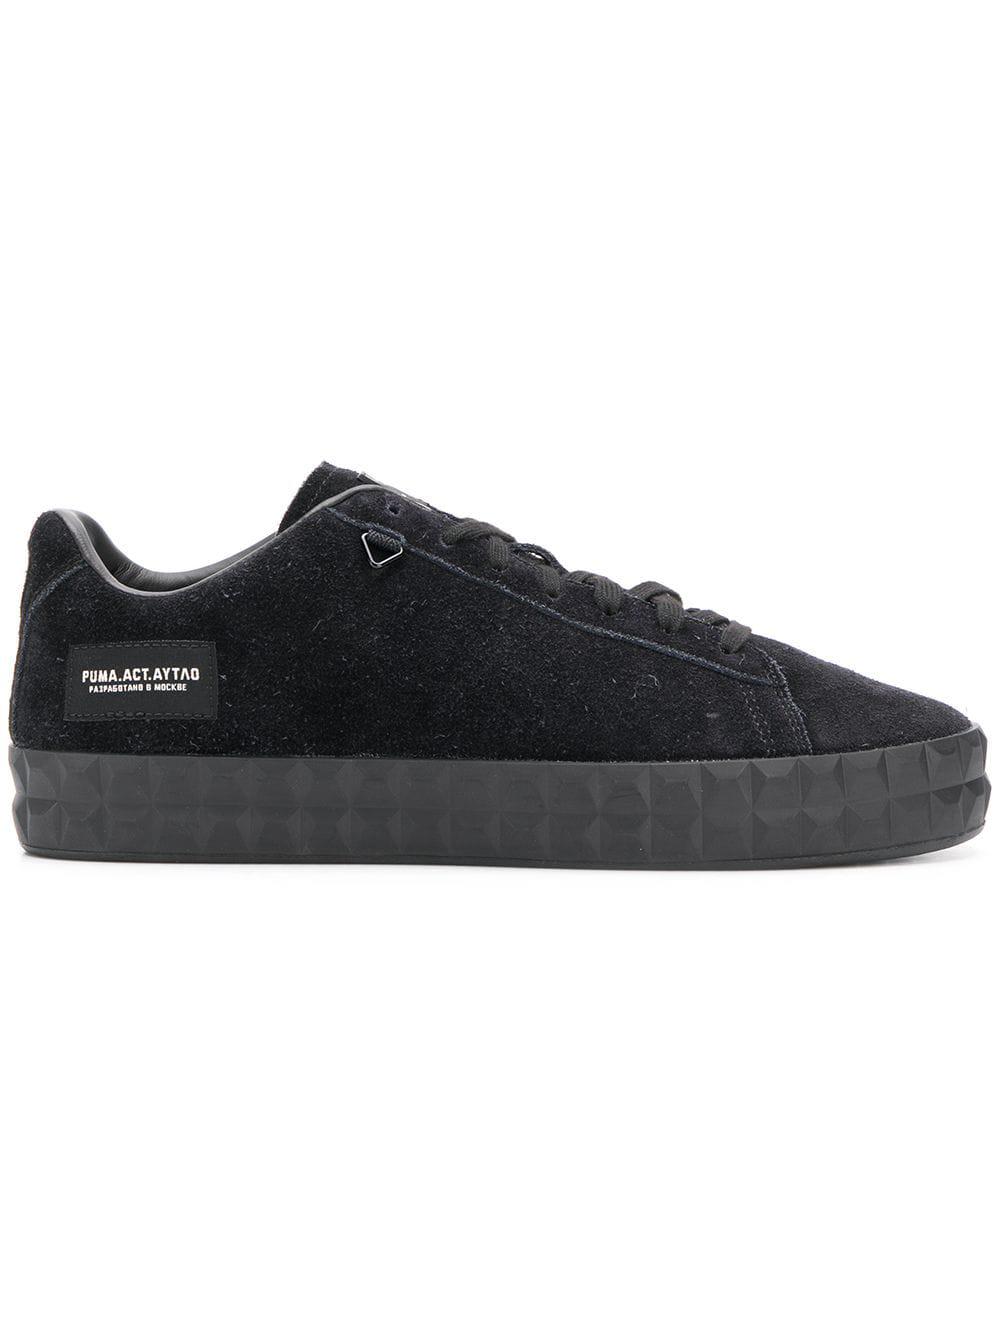 Puma Puma X Aytao Outlaw Moscow Court Platform Sneakers Black